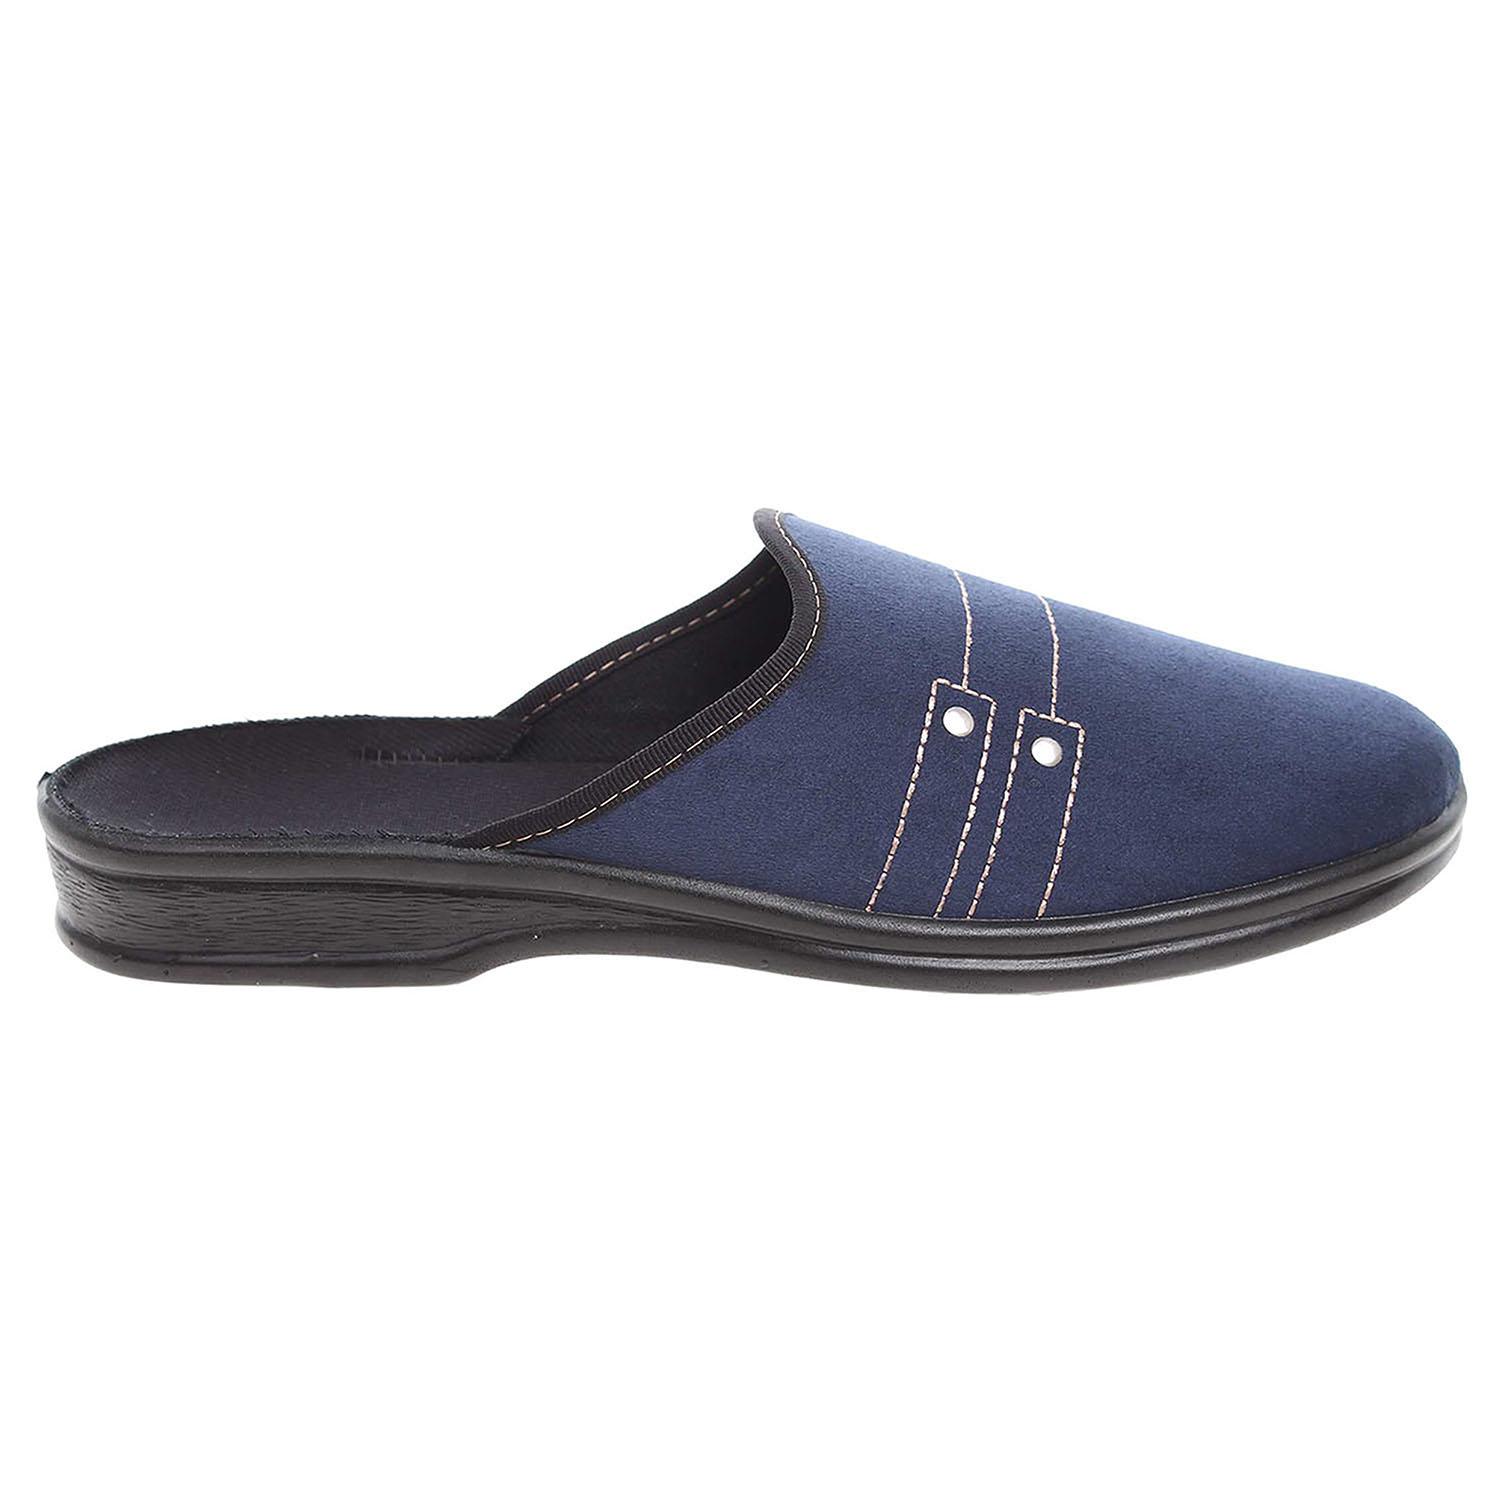 Ecco Befado domácí pantofle 089M398 modré 24800212